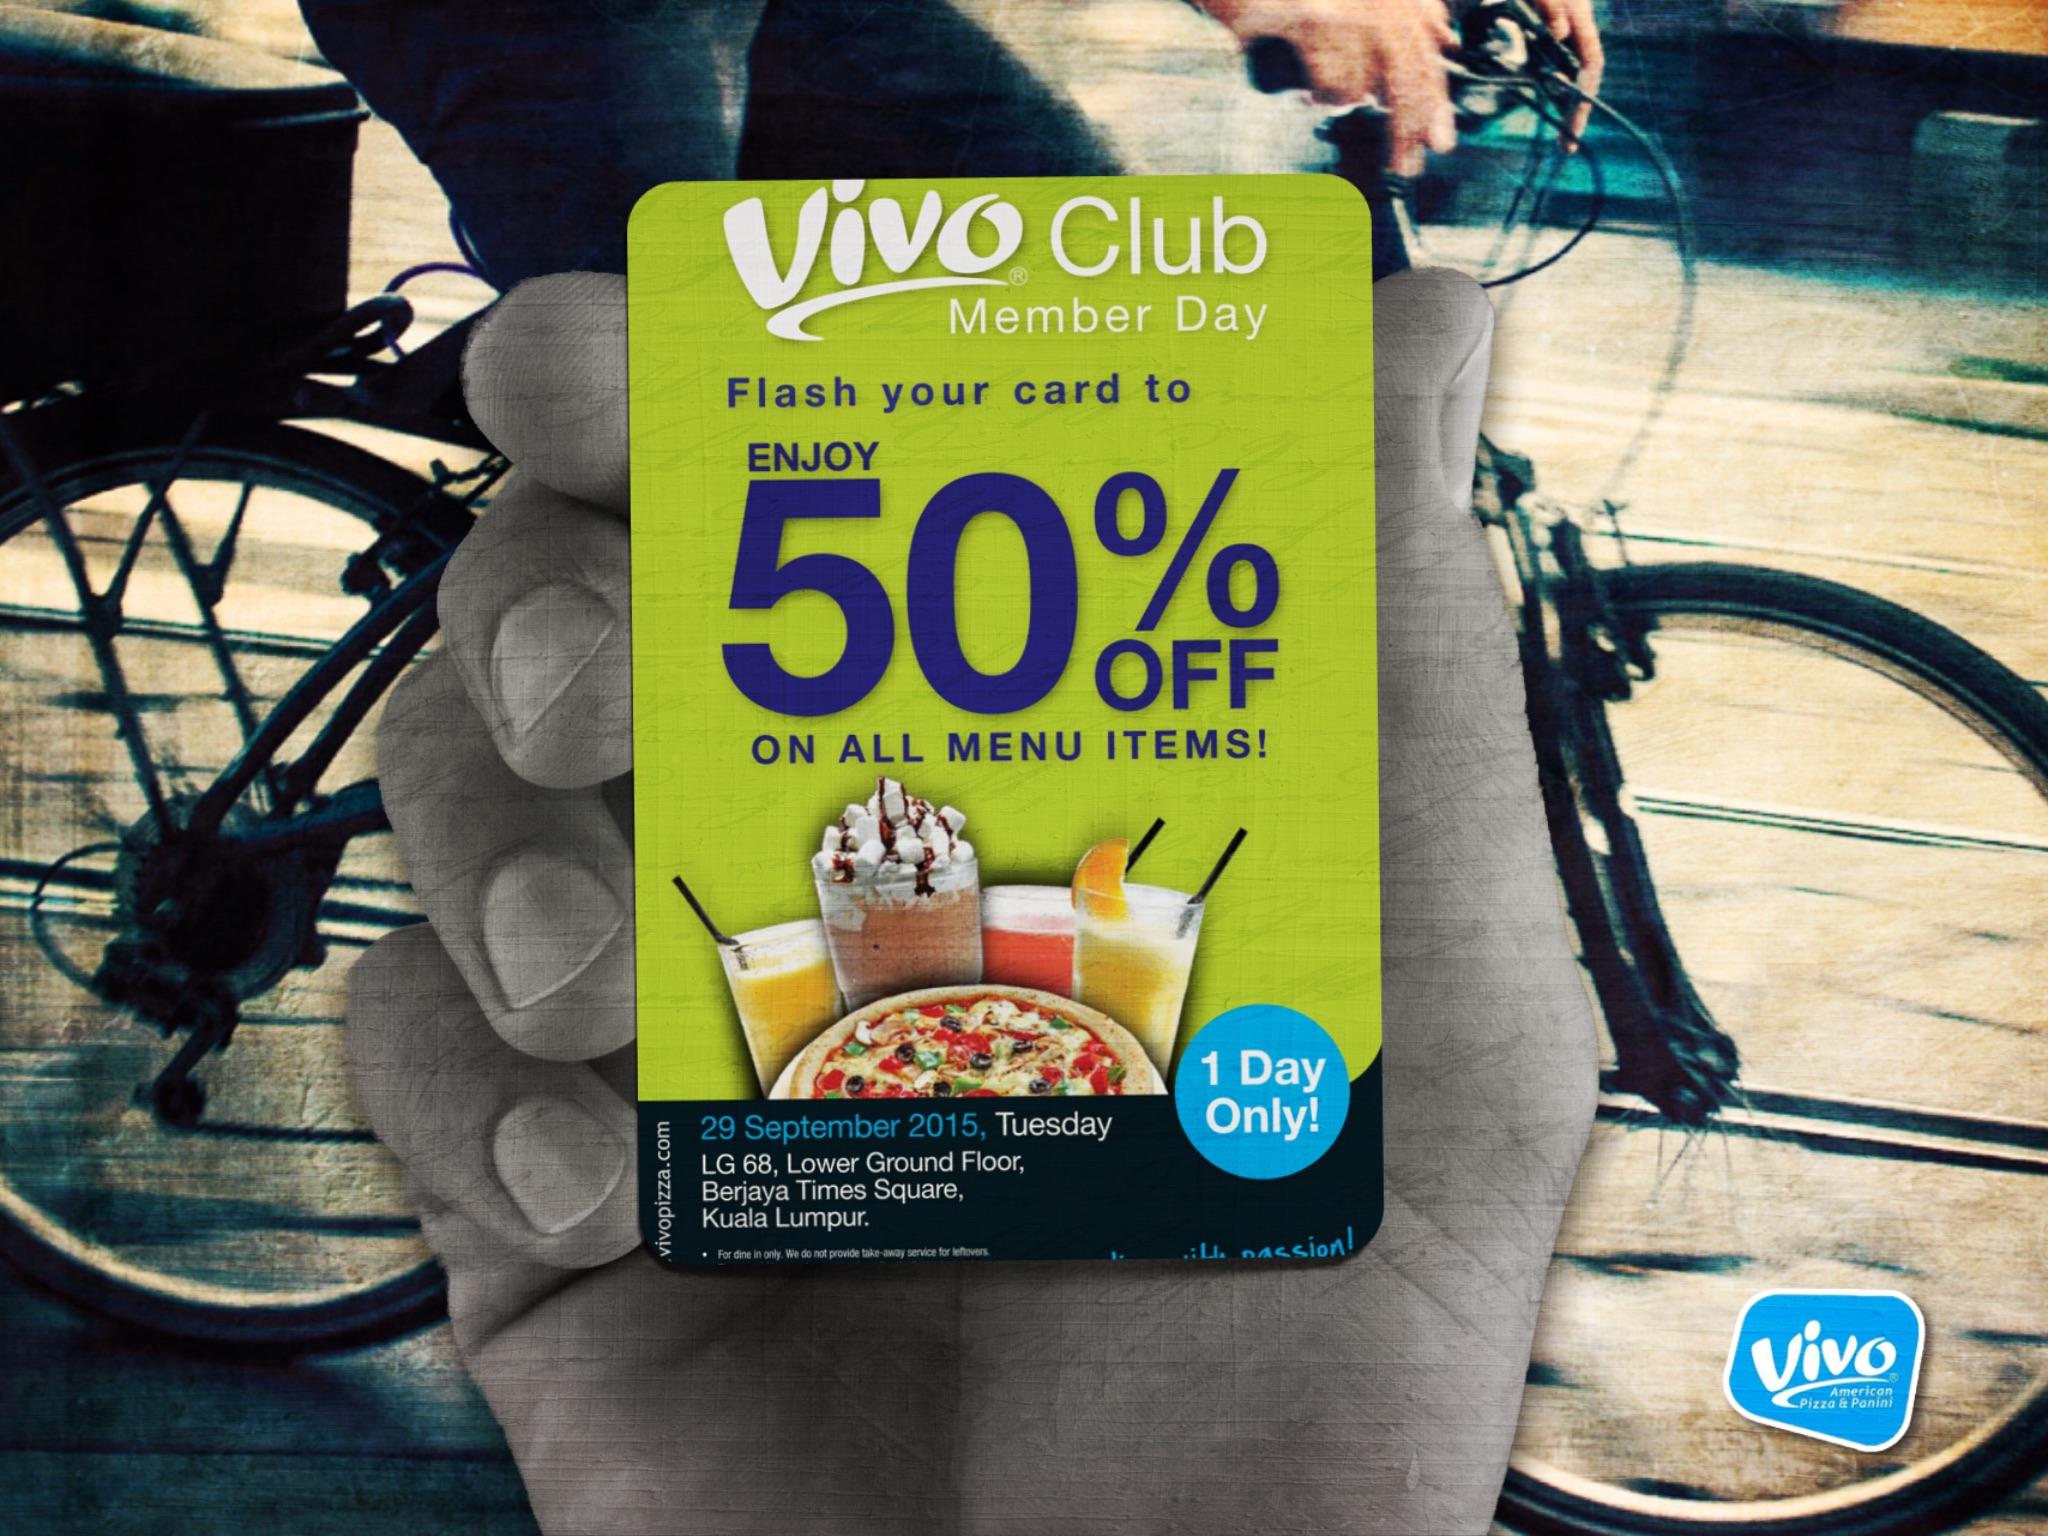 Vivo Club Member Day @ Berjaya Times Square